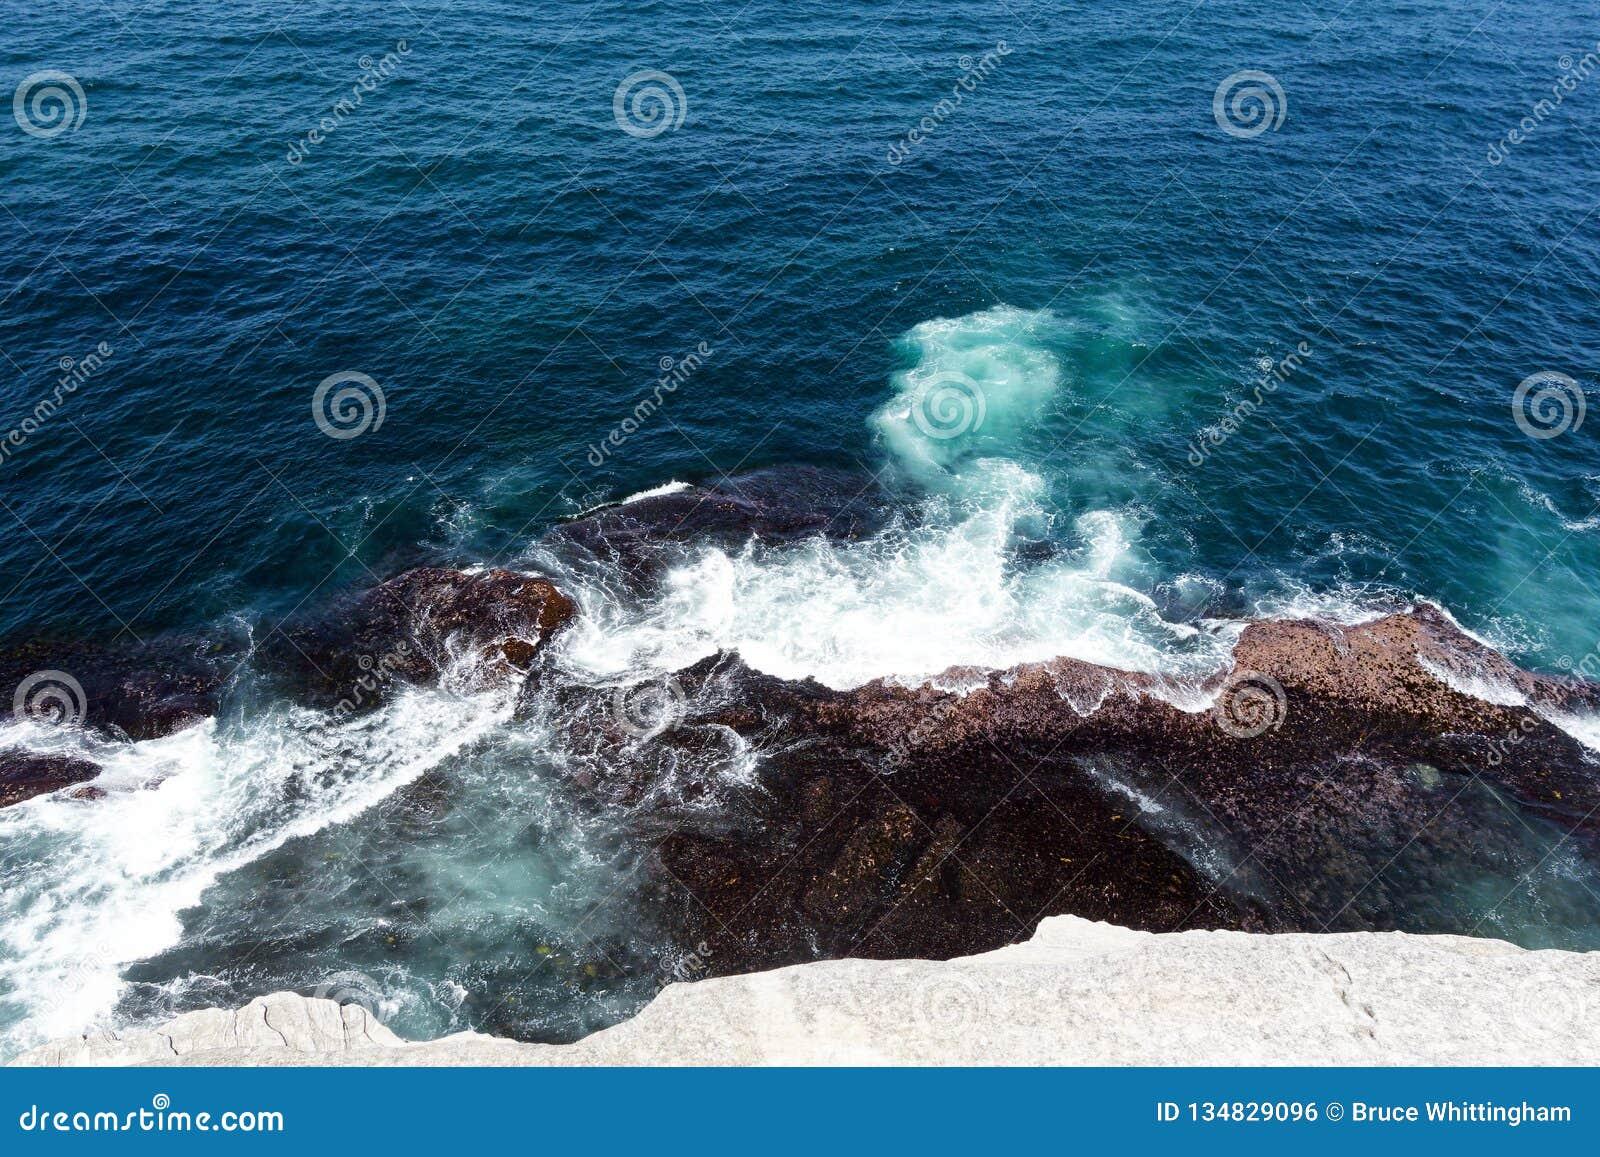 Pacific Ocean Waves on Sydney Cliffs, Australia